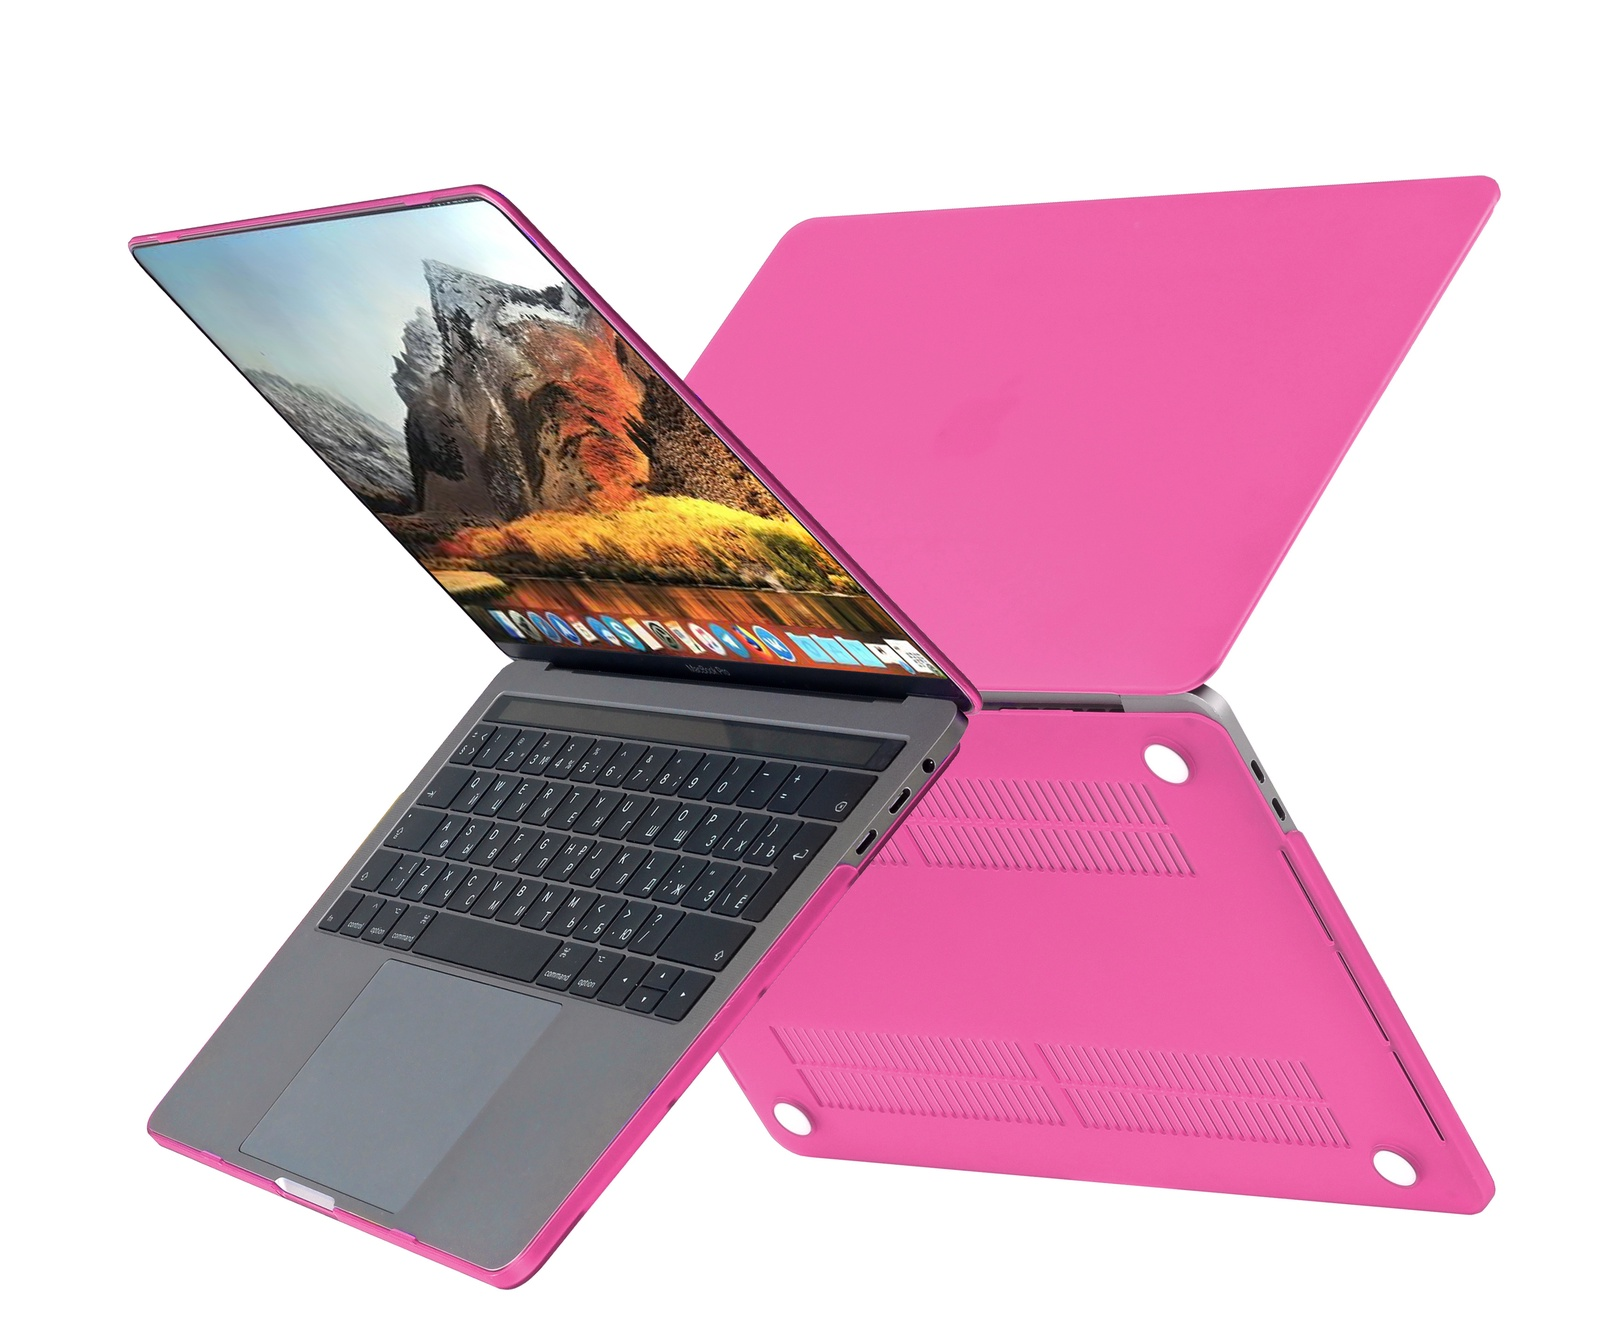 Чехол HardShell Case для Macbook Pro 13 Retina, фуксия цена